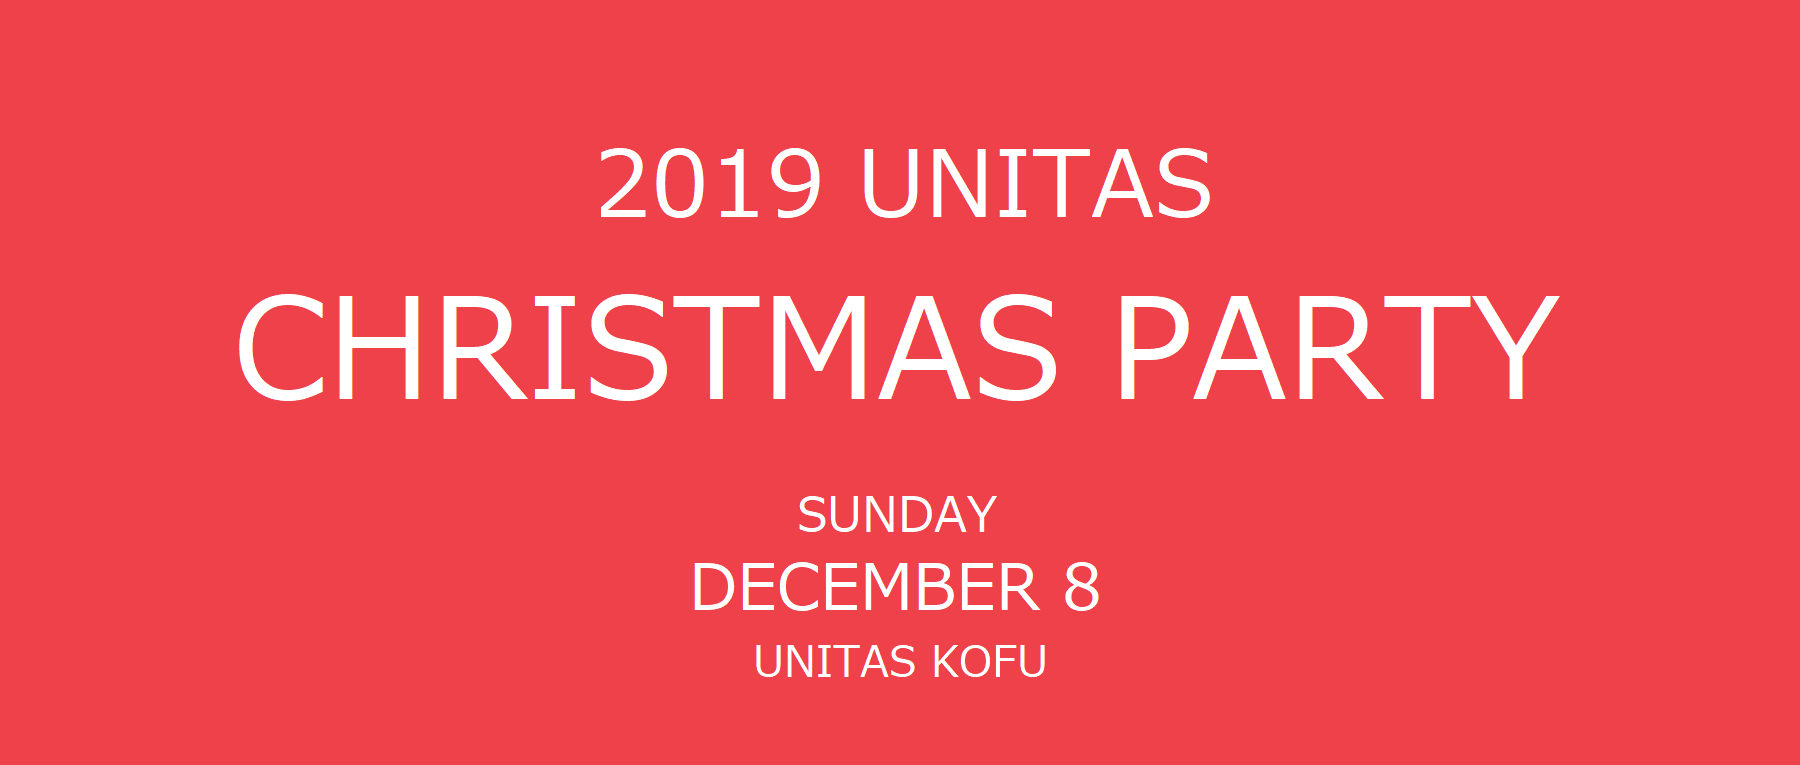 2019 UNITAS CHRISTMAS PARTY